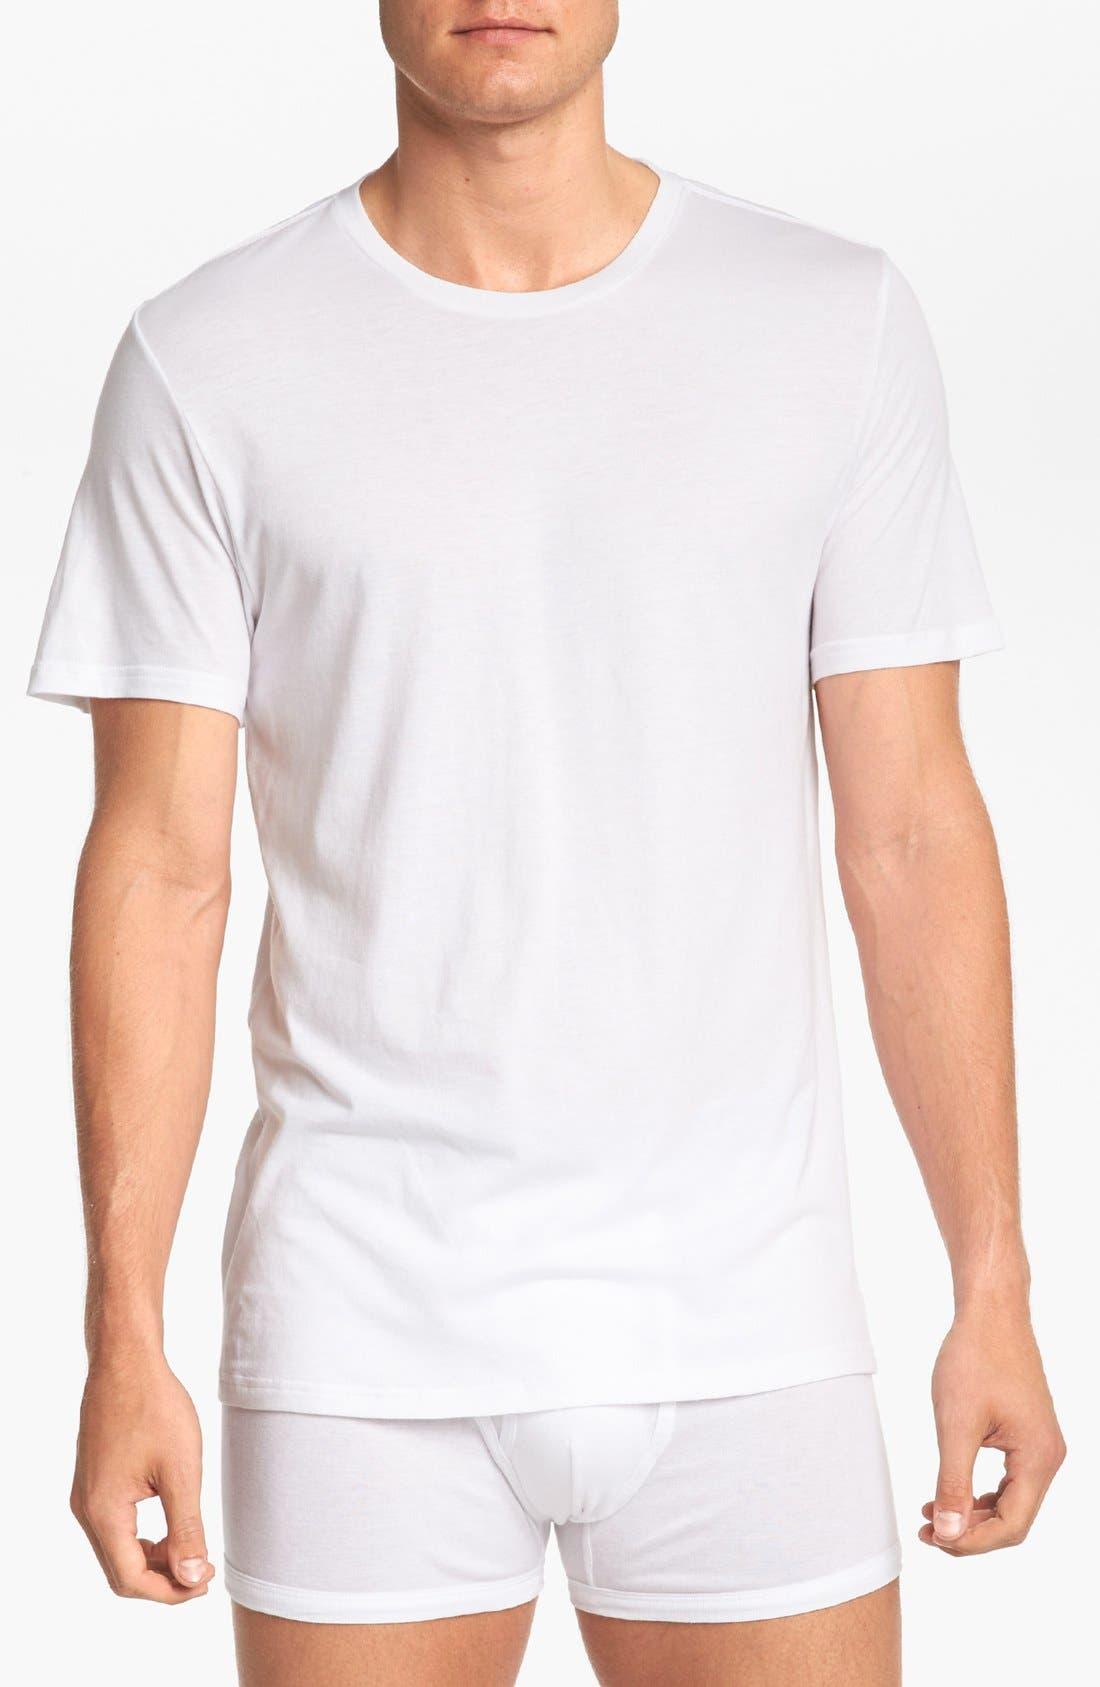 Main Image - Michael Kors 'Soft Touch' Crewneck T-Shirt (3-Pack)